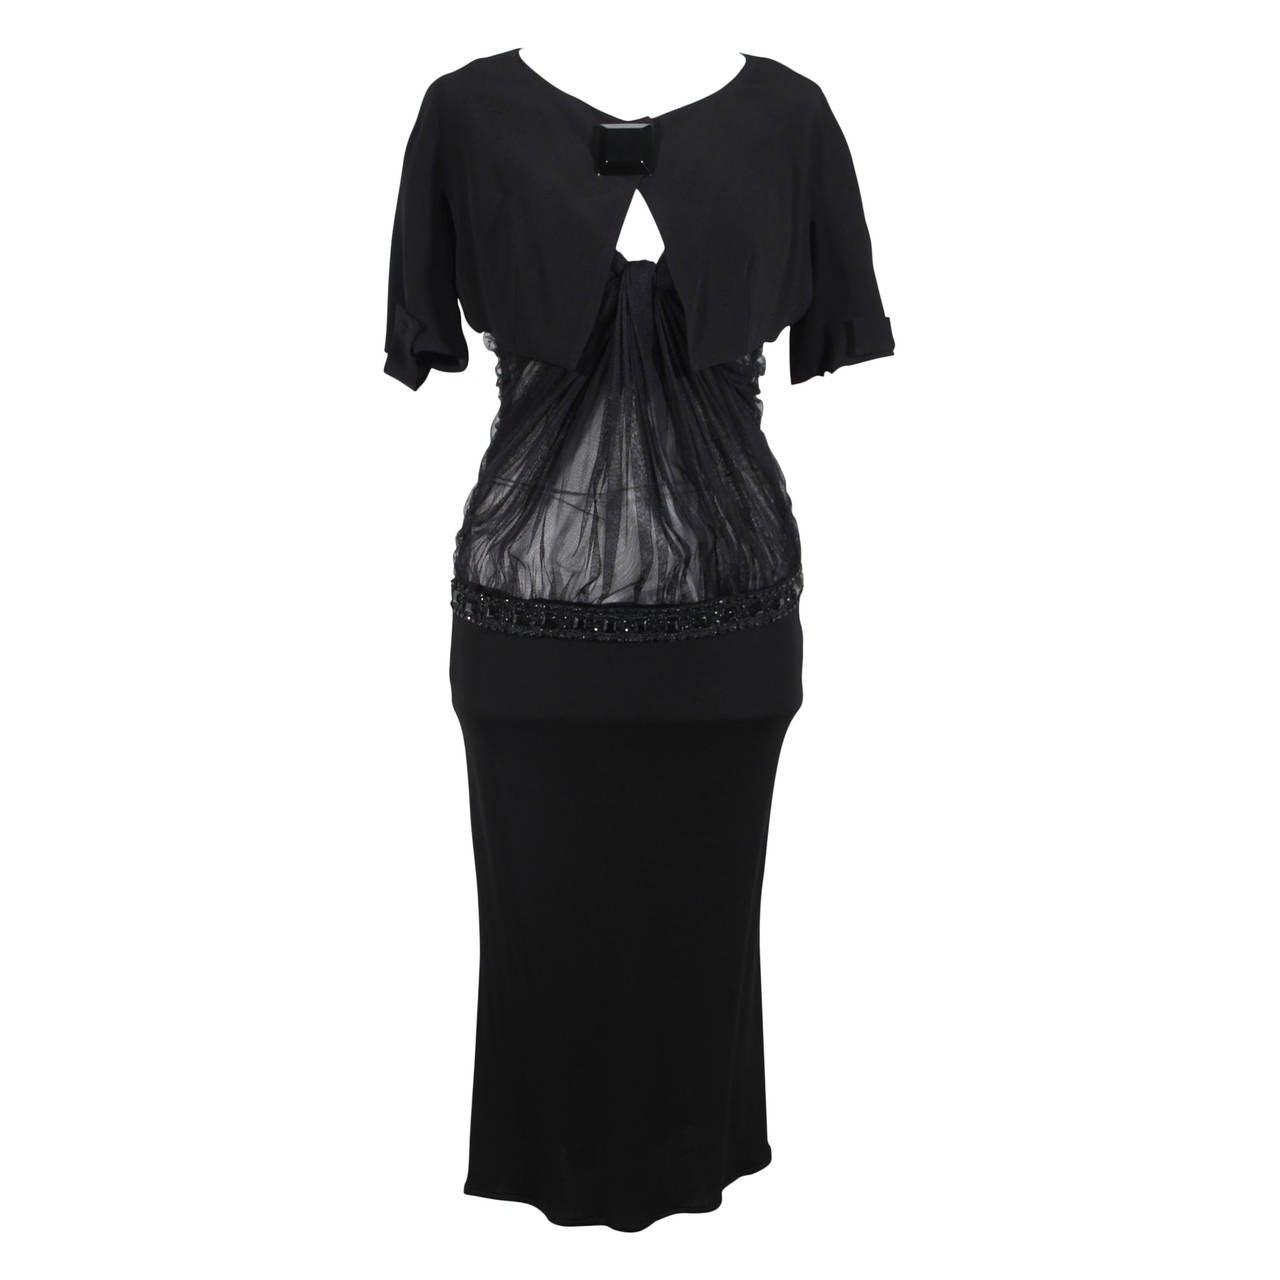 BLUMARINE ANNA MOLINARI Black Jeweled EVENING DRESS w/ Cropped JACKET FF